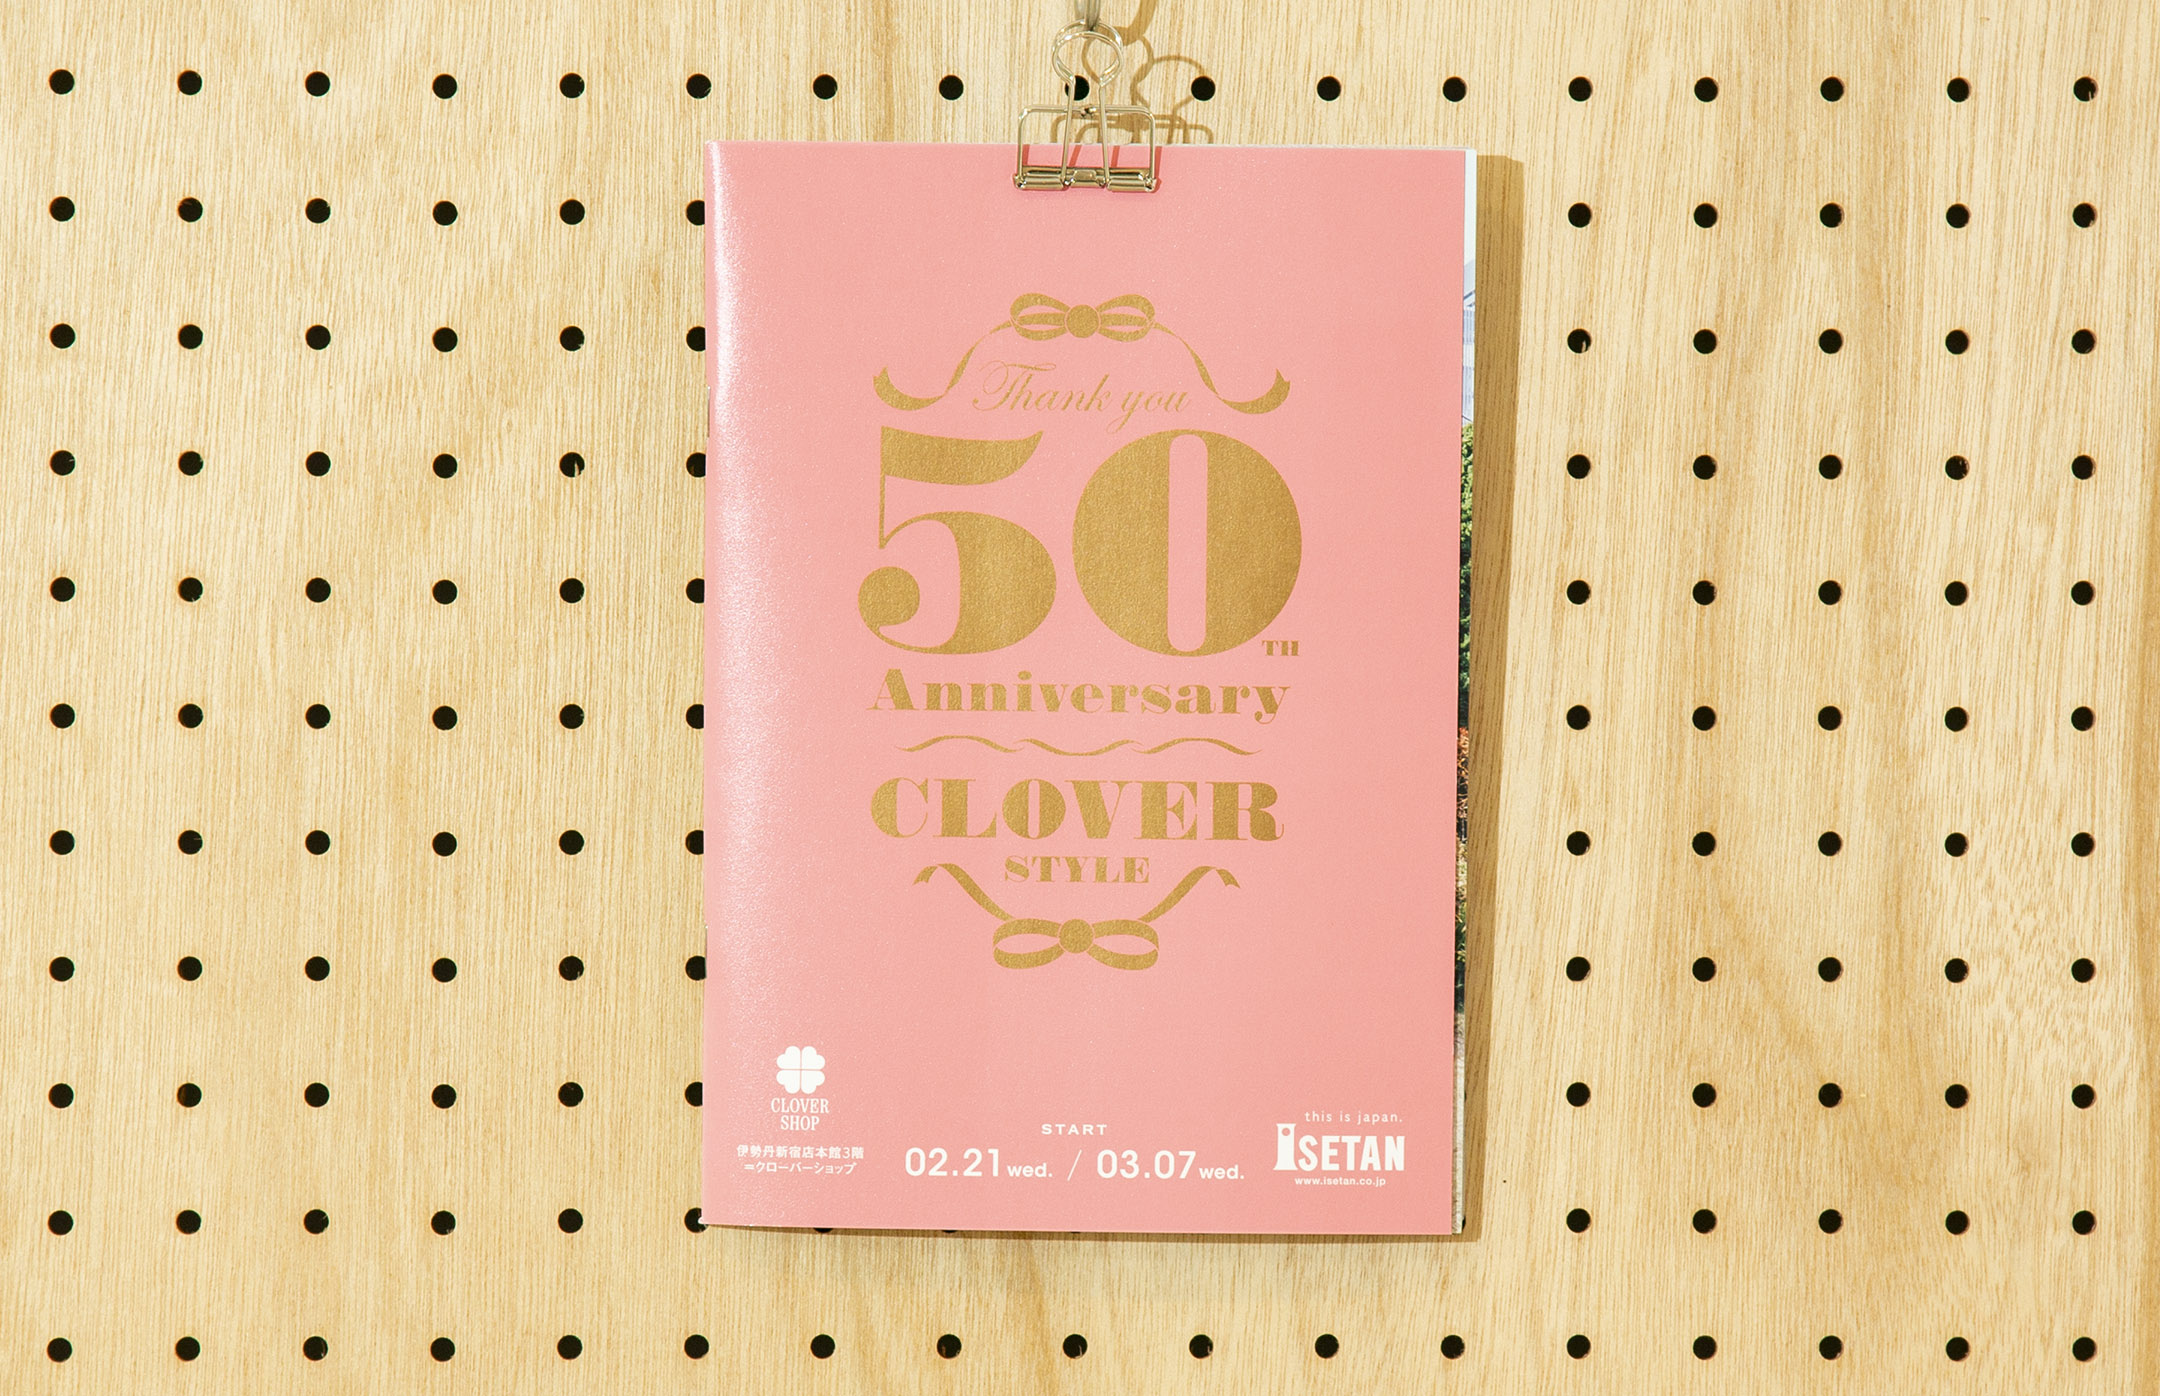 ISETAN  50th Anniversary CLOVER STYLE